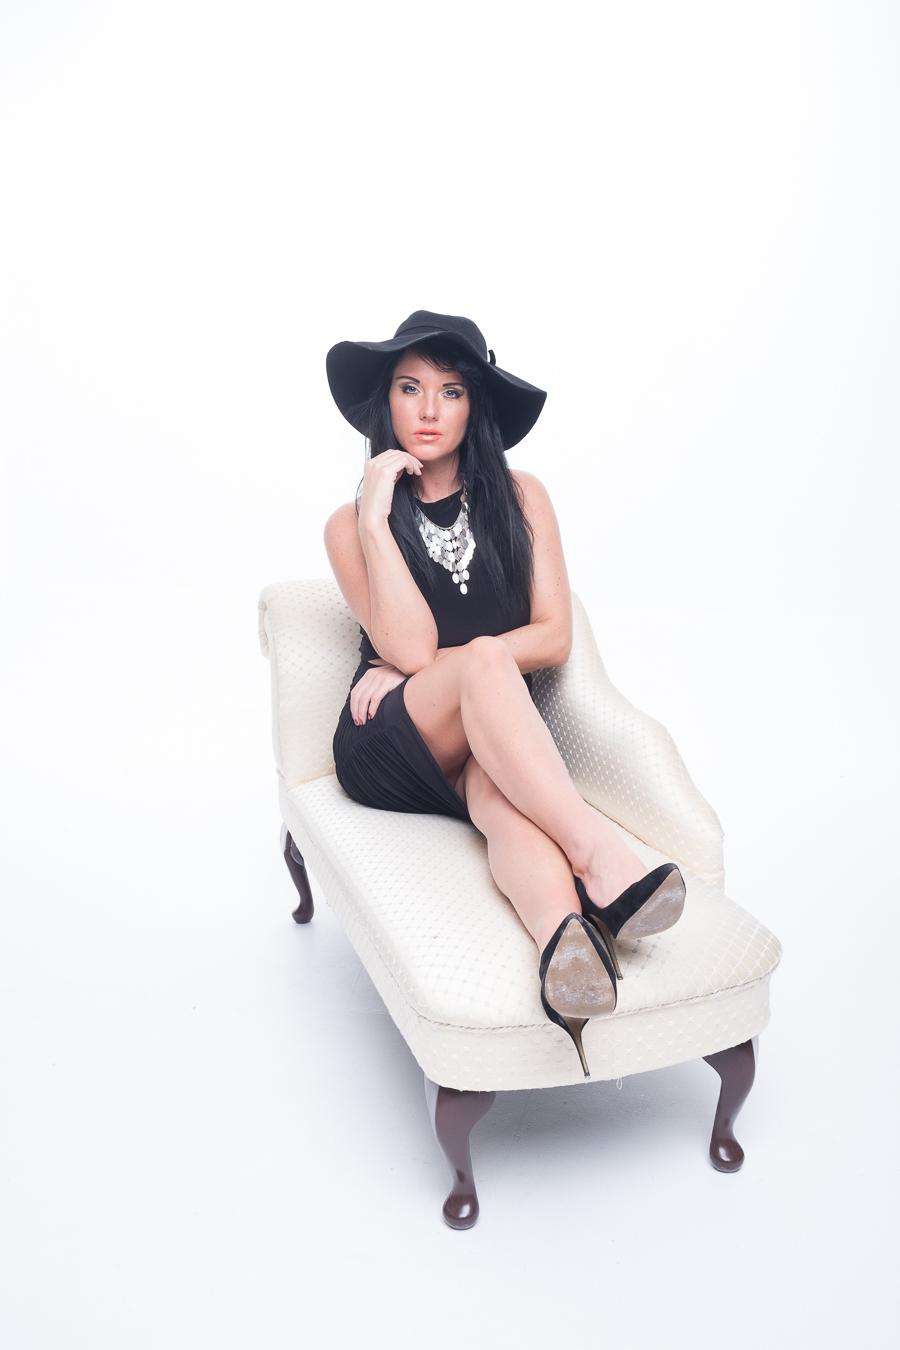 Raven Fashion 4 / Photography by FlashingBlade, Model Raven Lee / Uploaded 9th November 2015 @ 10:08 AM